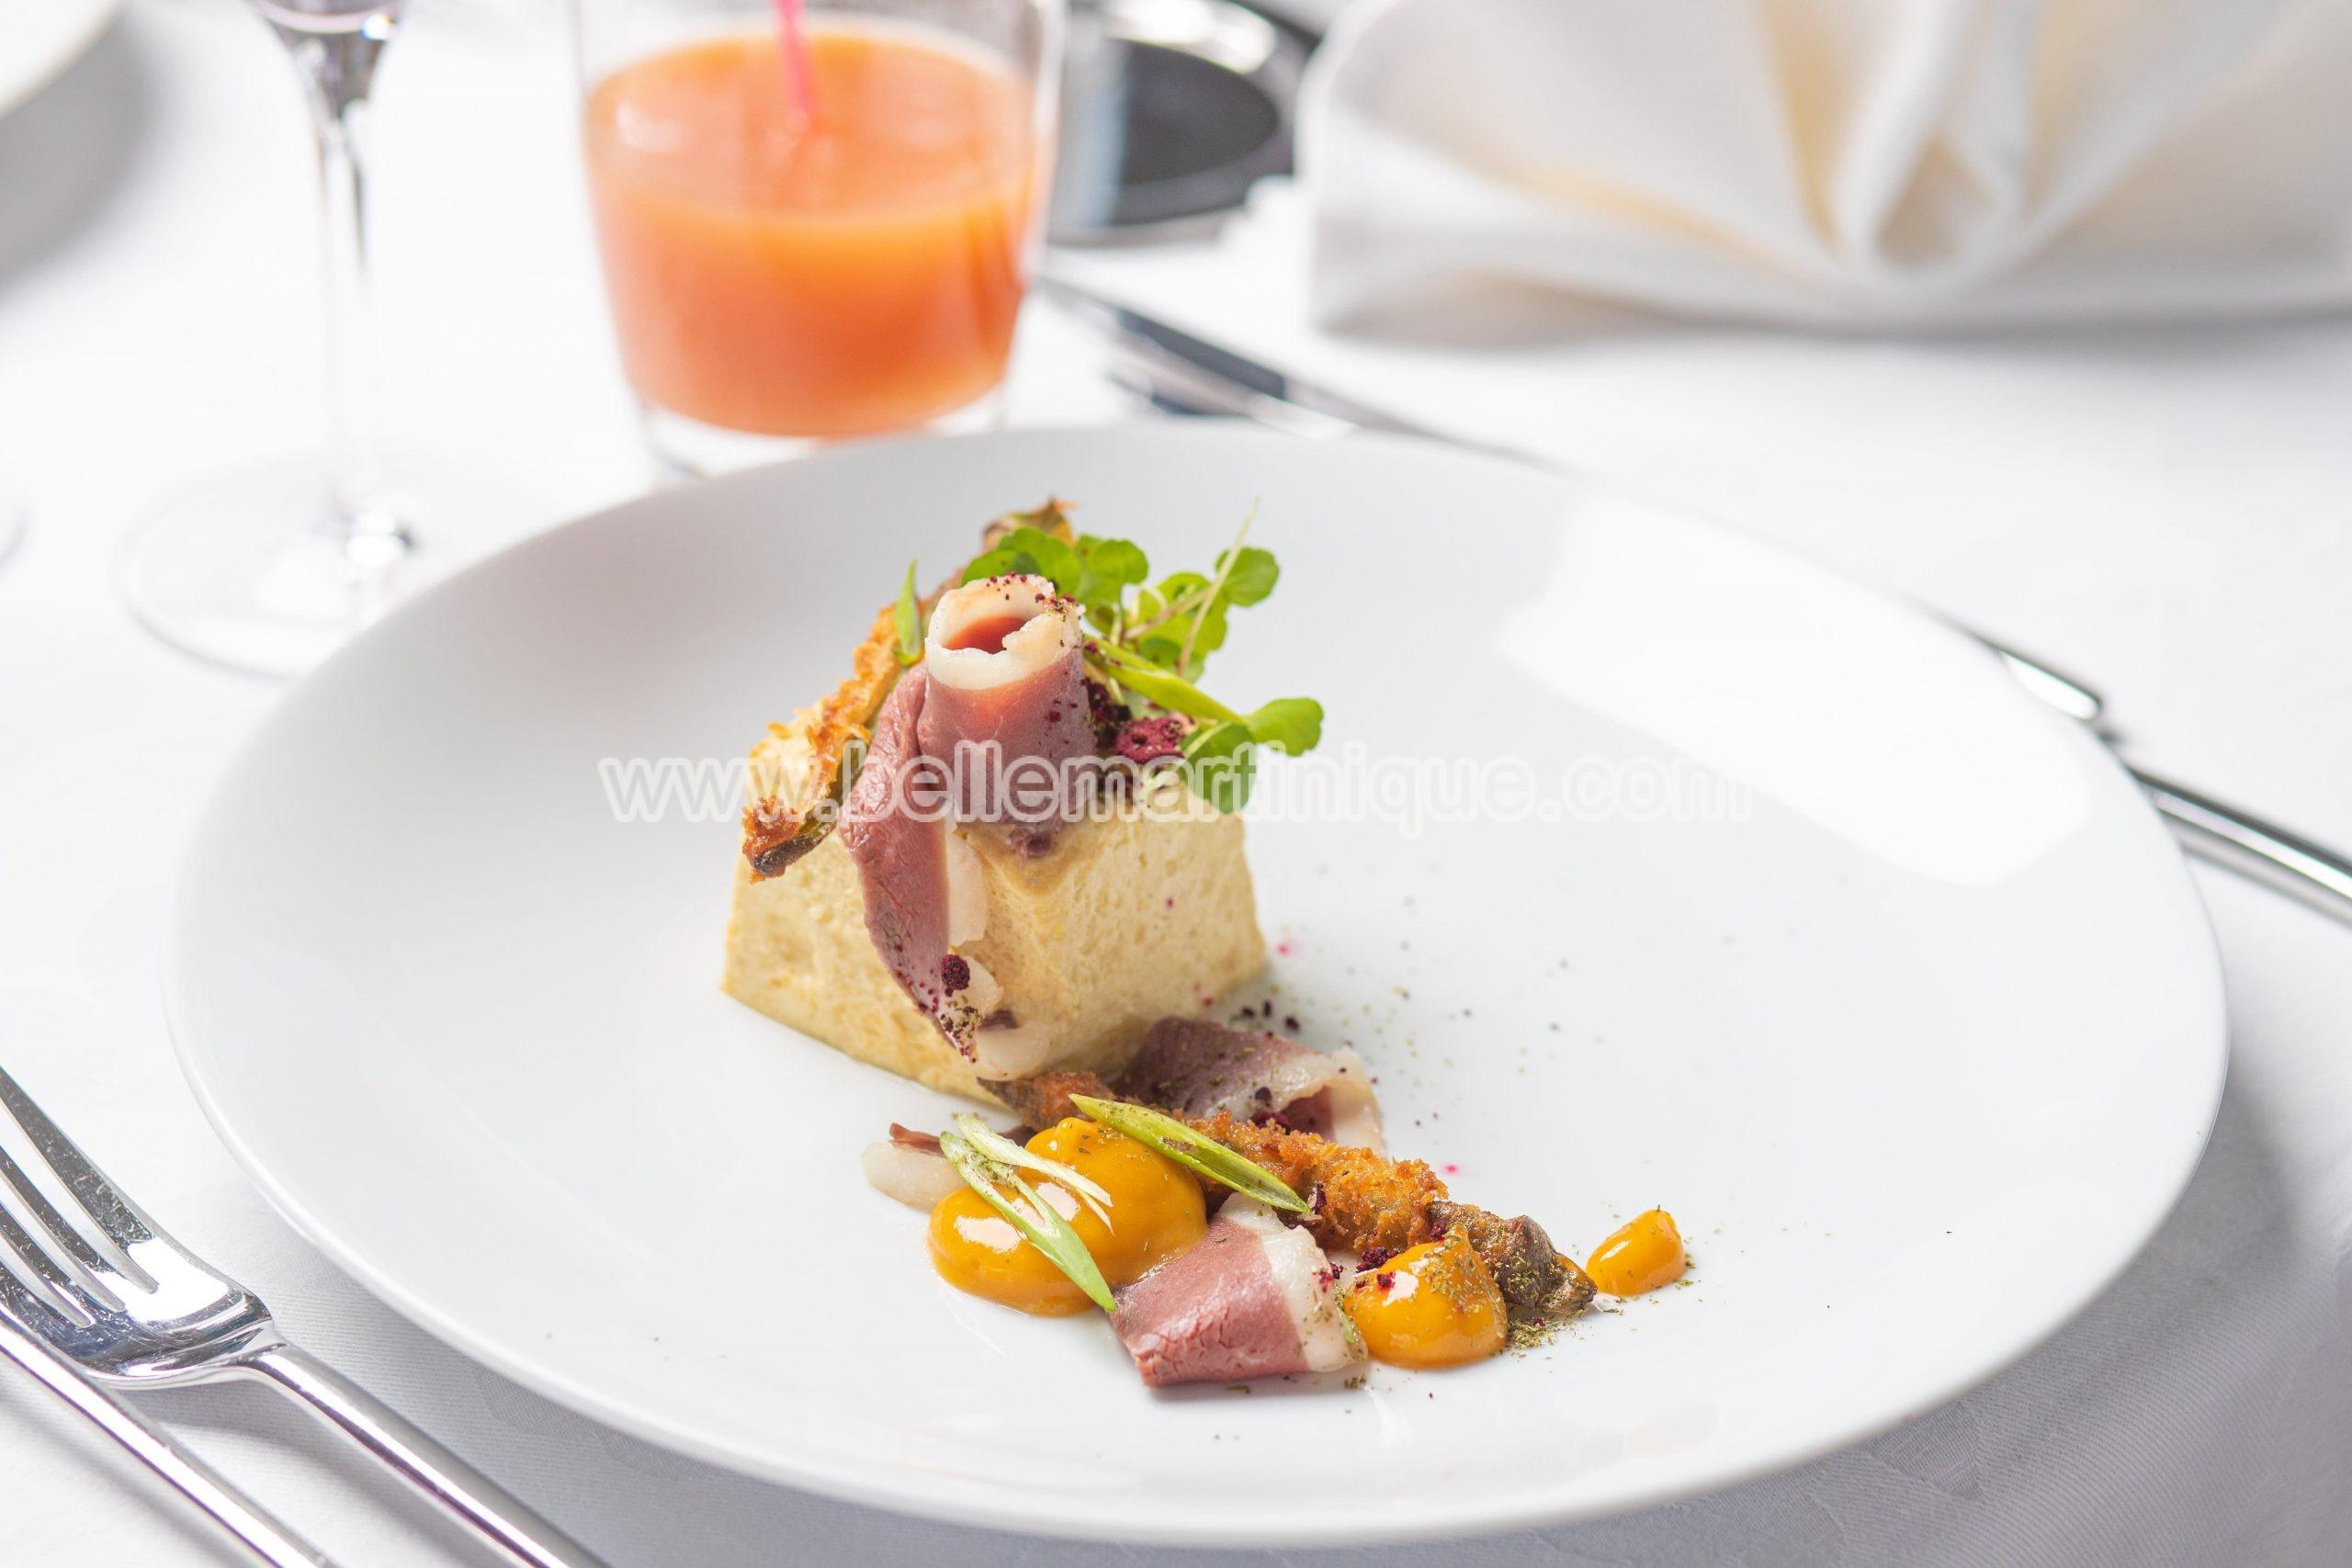 royale-de-giraumon-magret-de-canard-boucané-recette-chef-ruddy-nonone-martinique